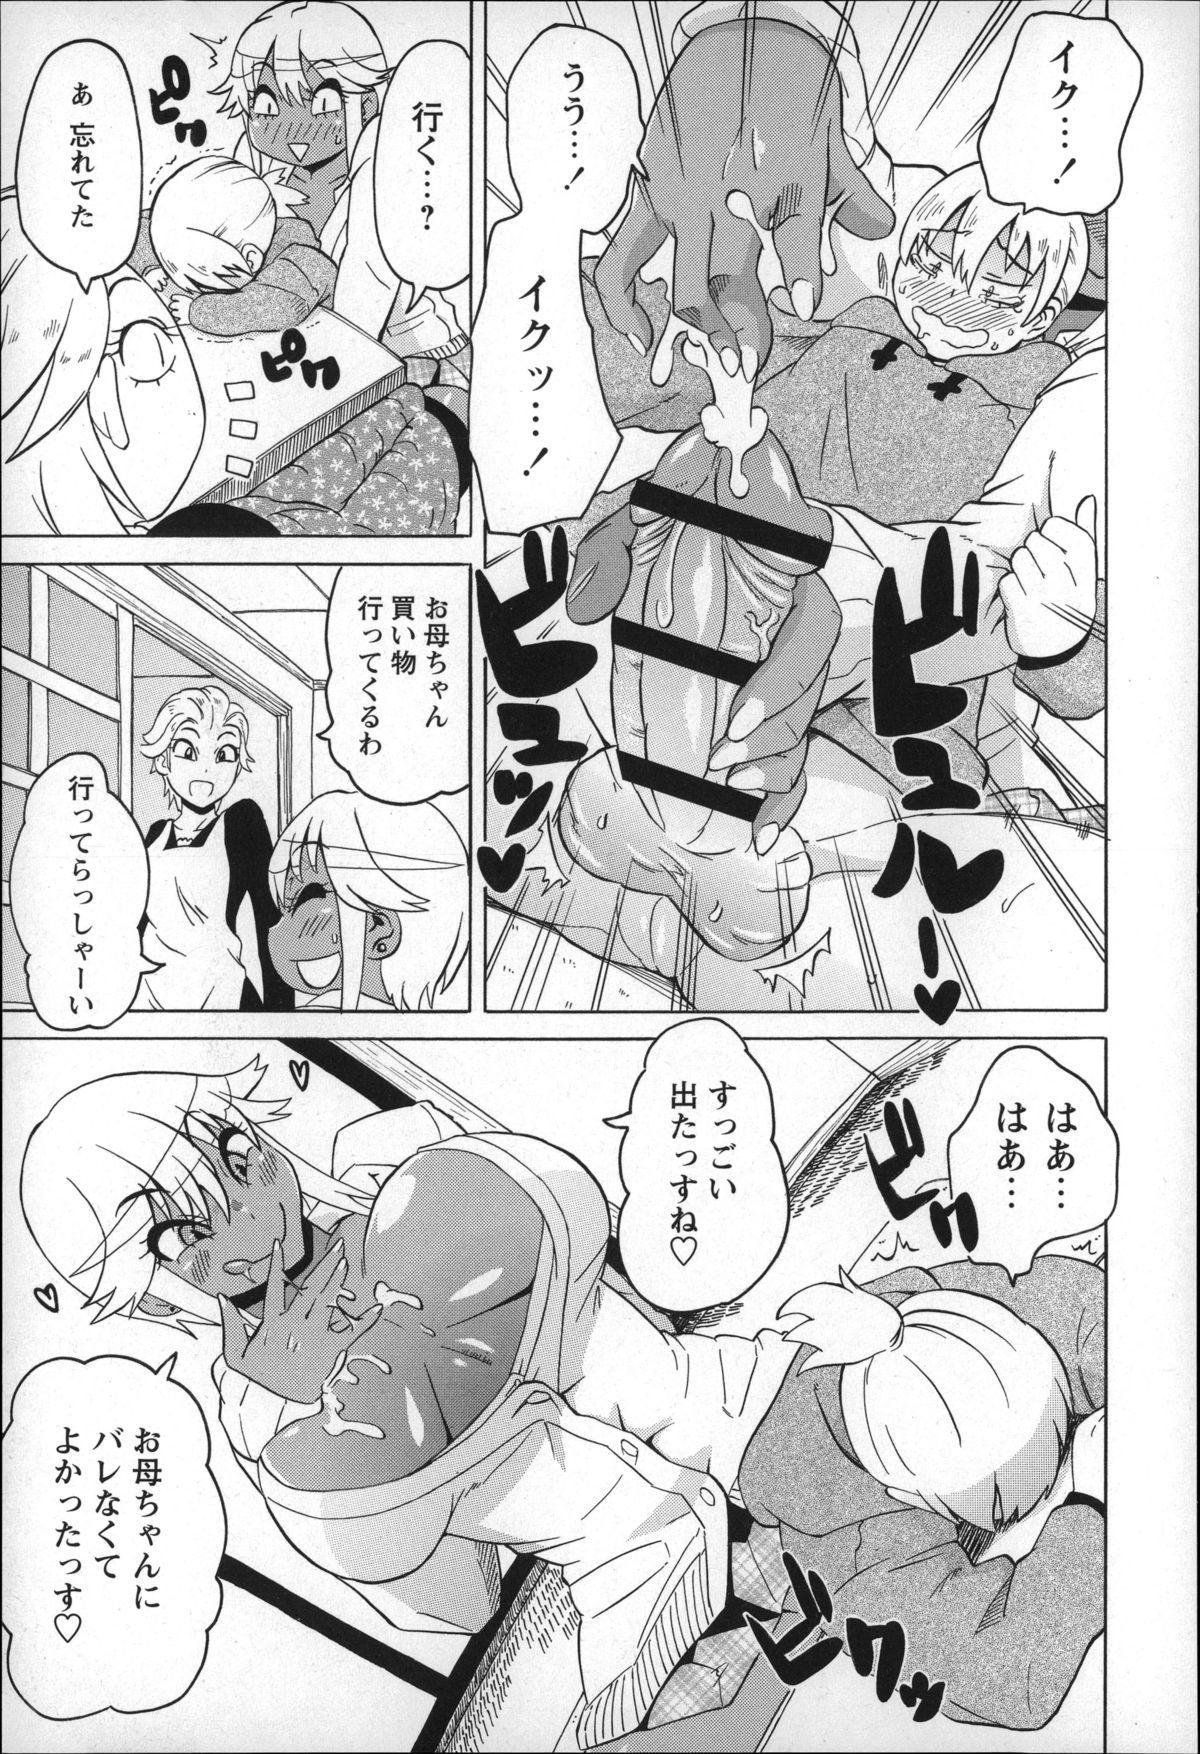 Shota Hunting 102